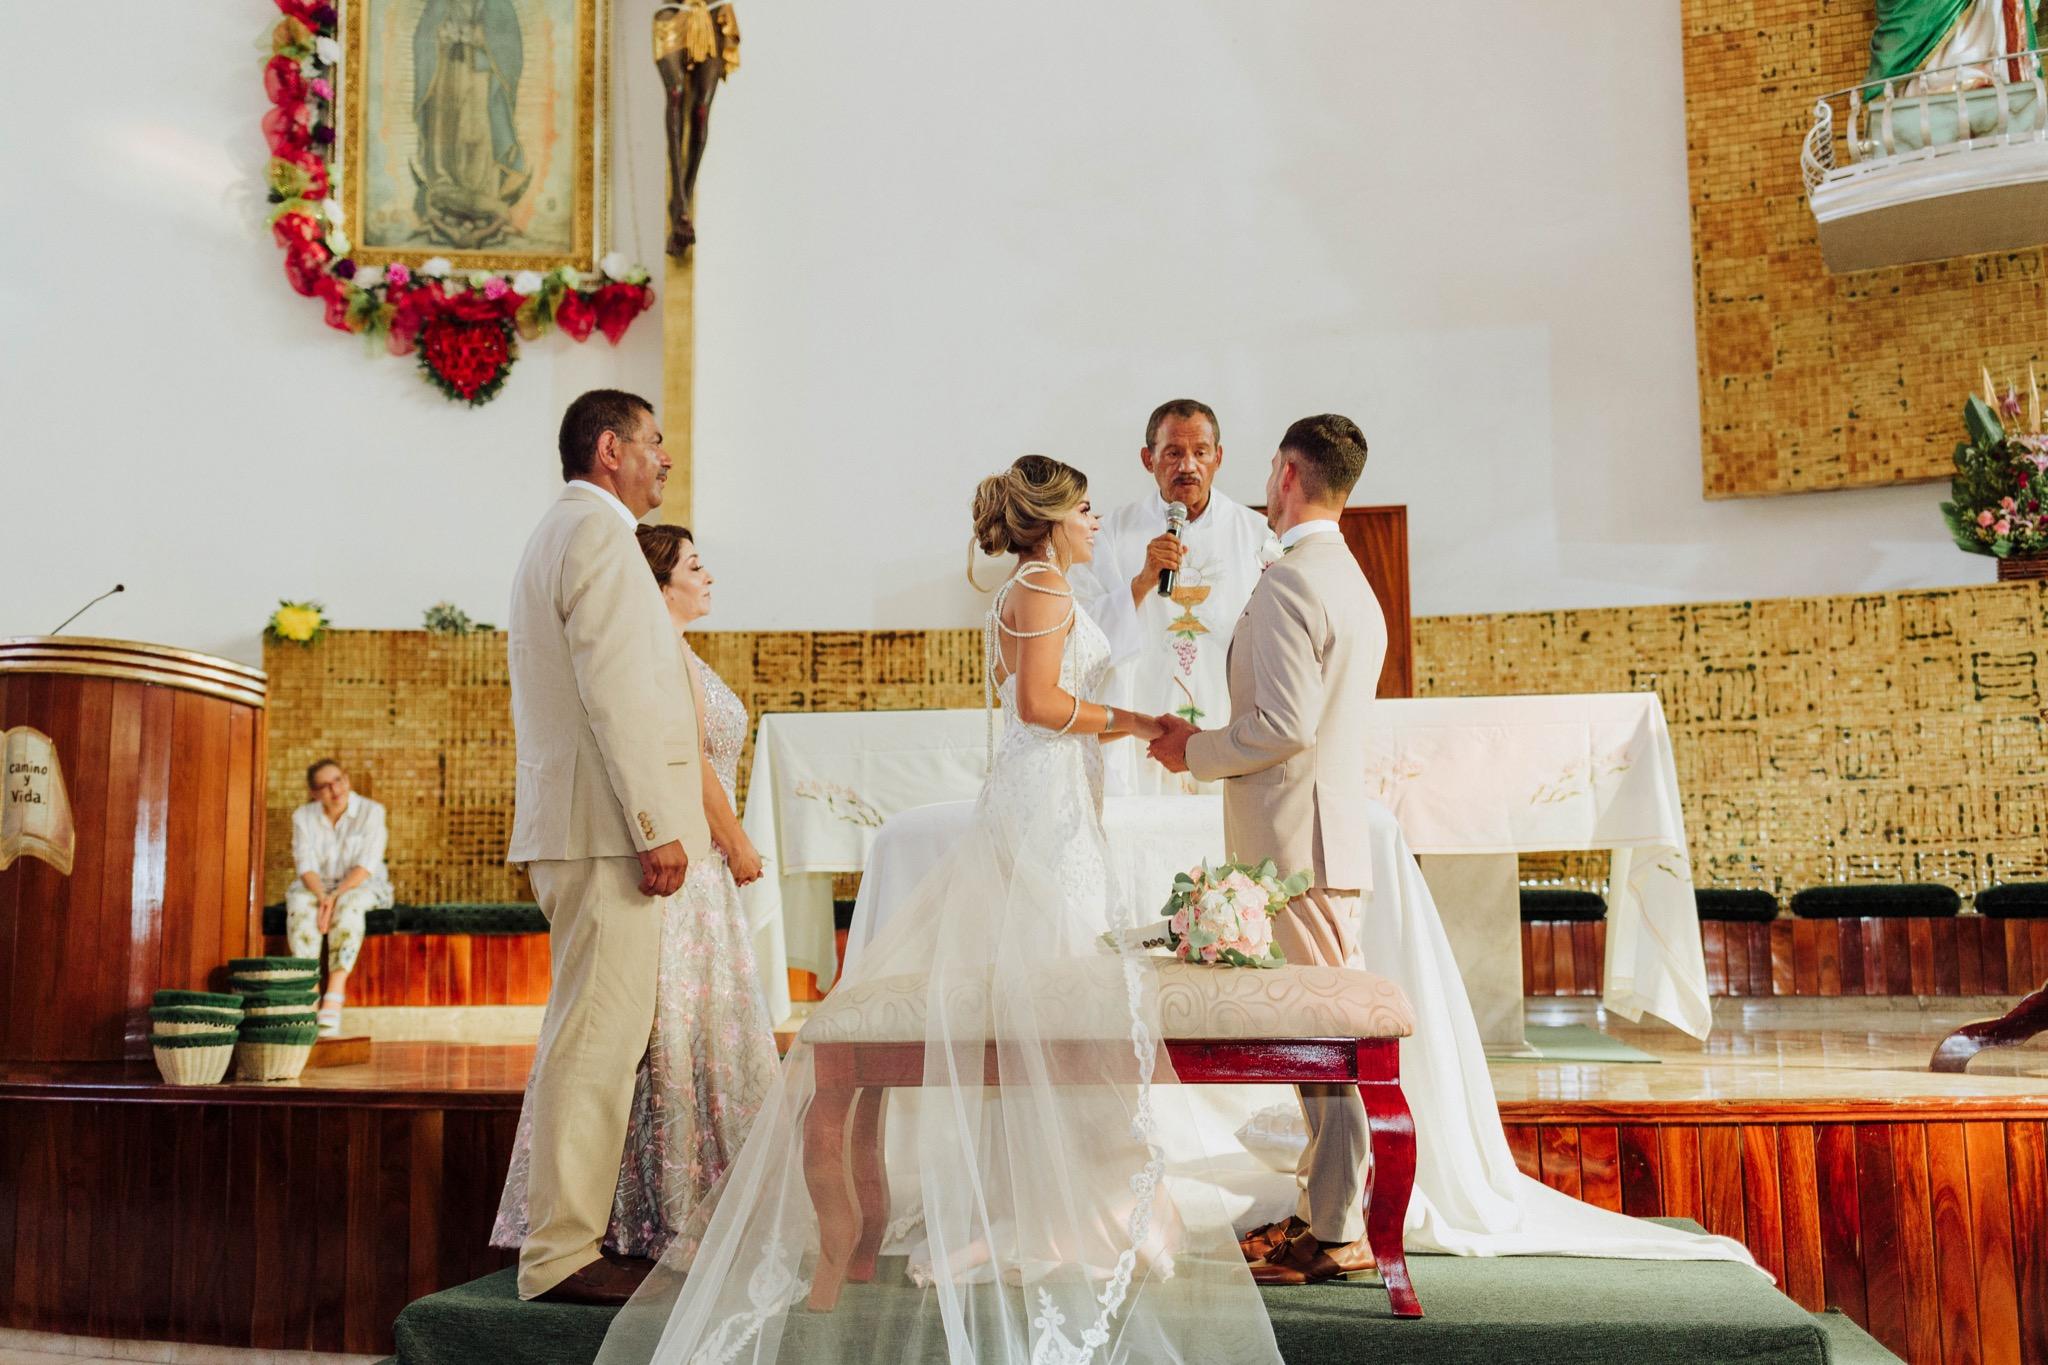 Javier_noriega_fotografo_bodas_profesional_zacatecas_mexico_mazatlan_sinaloa_photographer_weddings25